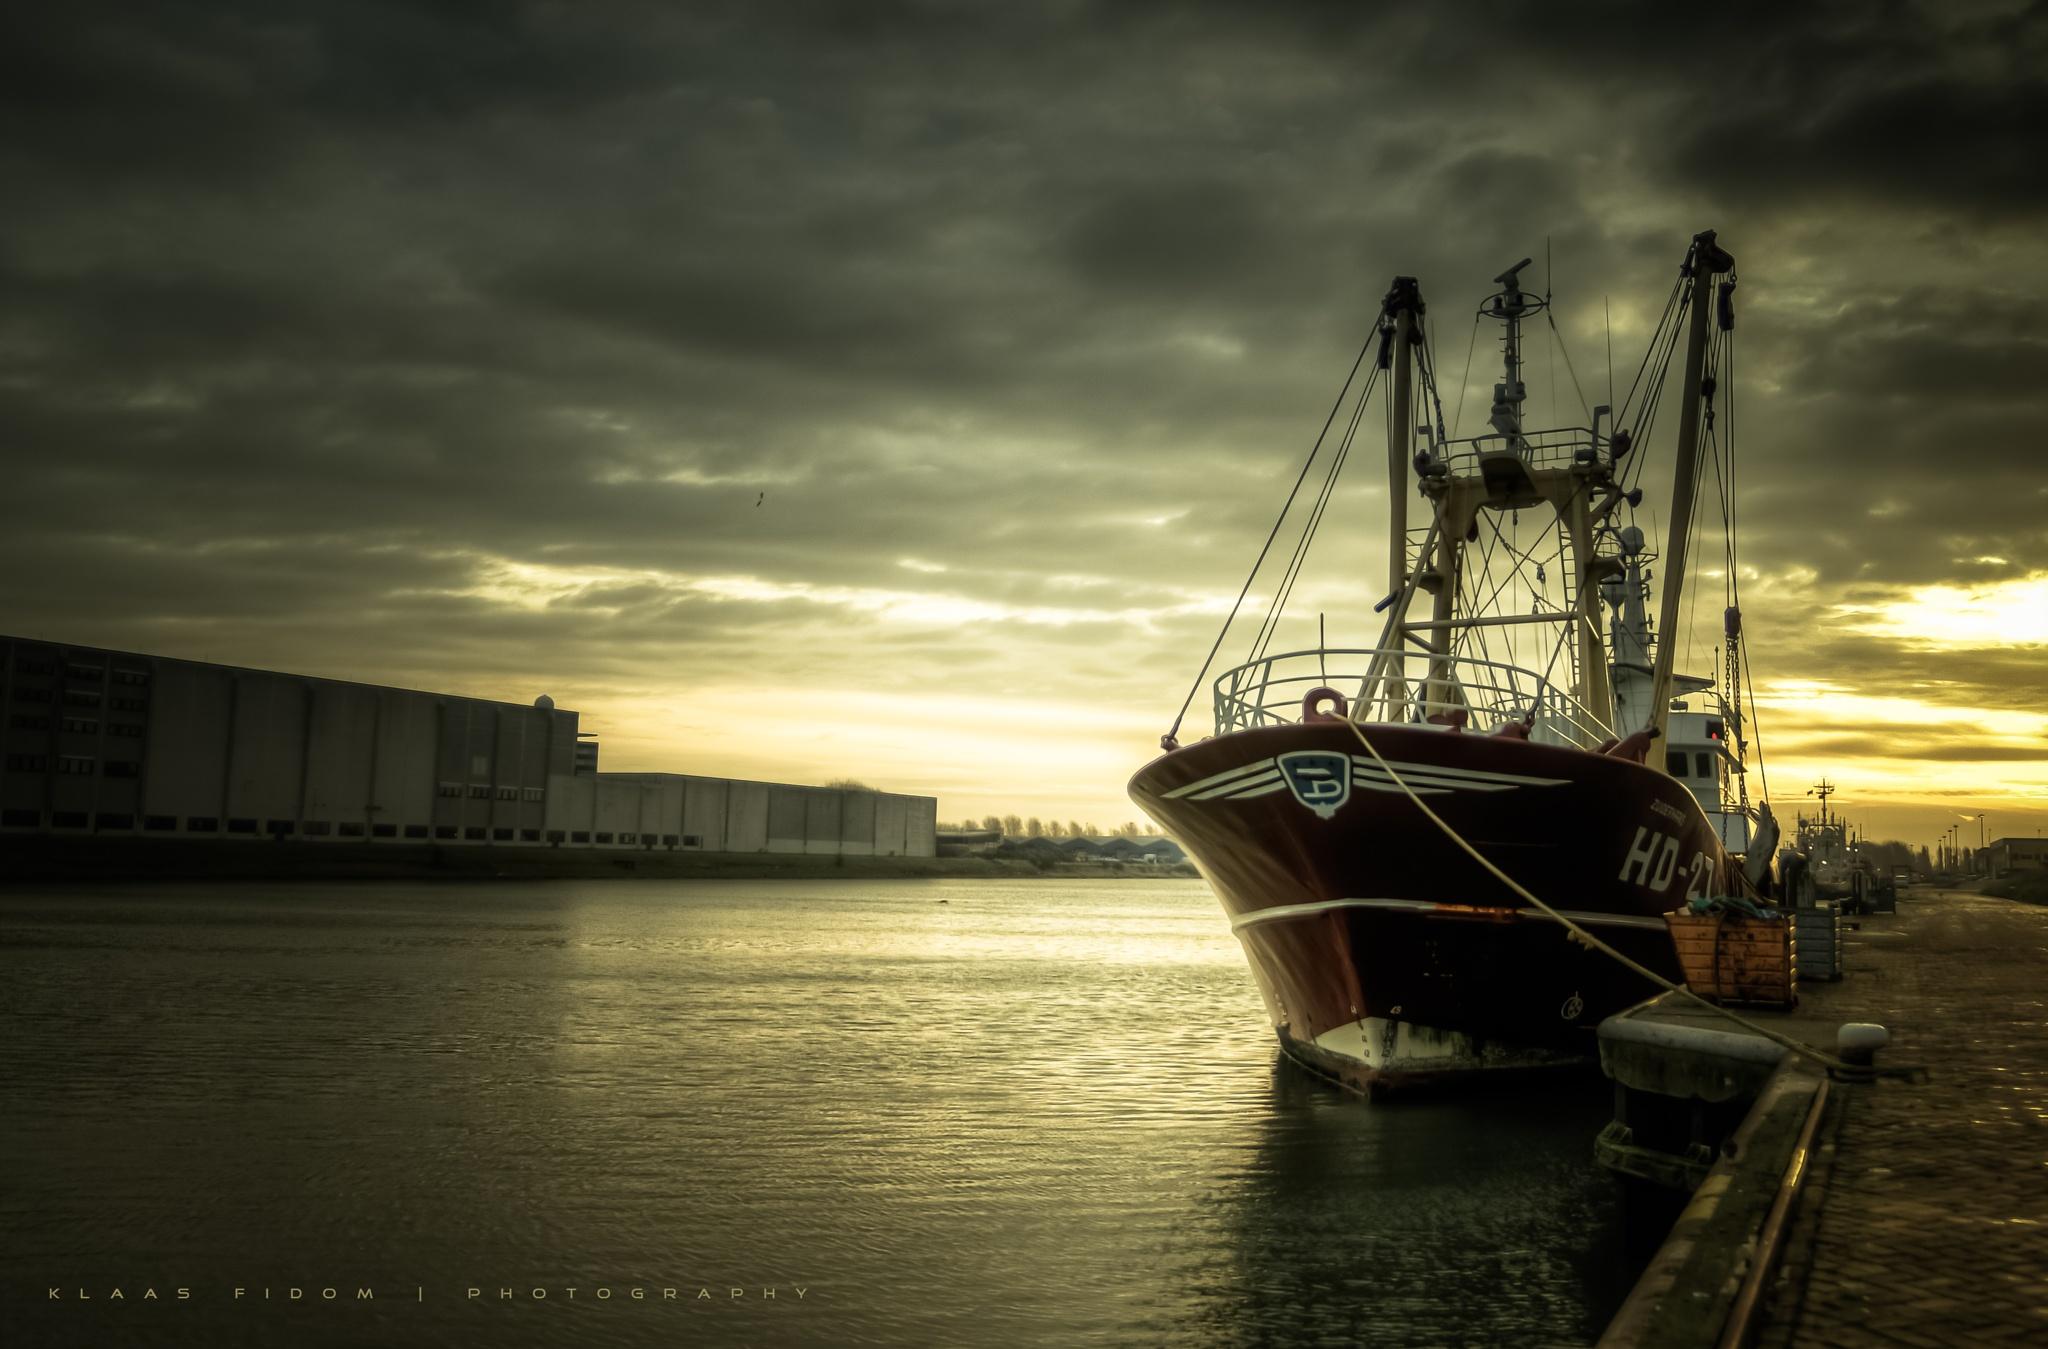 Fisherman by KlaasFidom